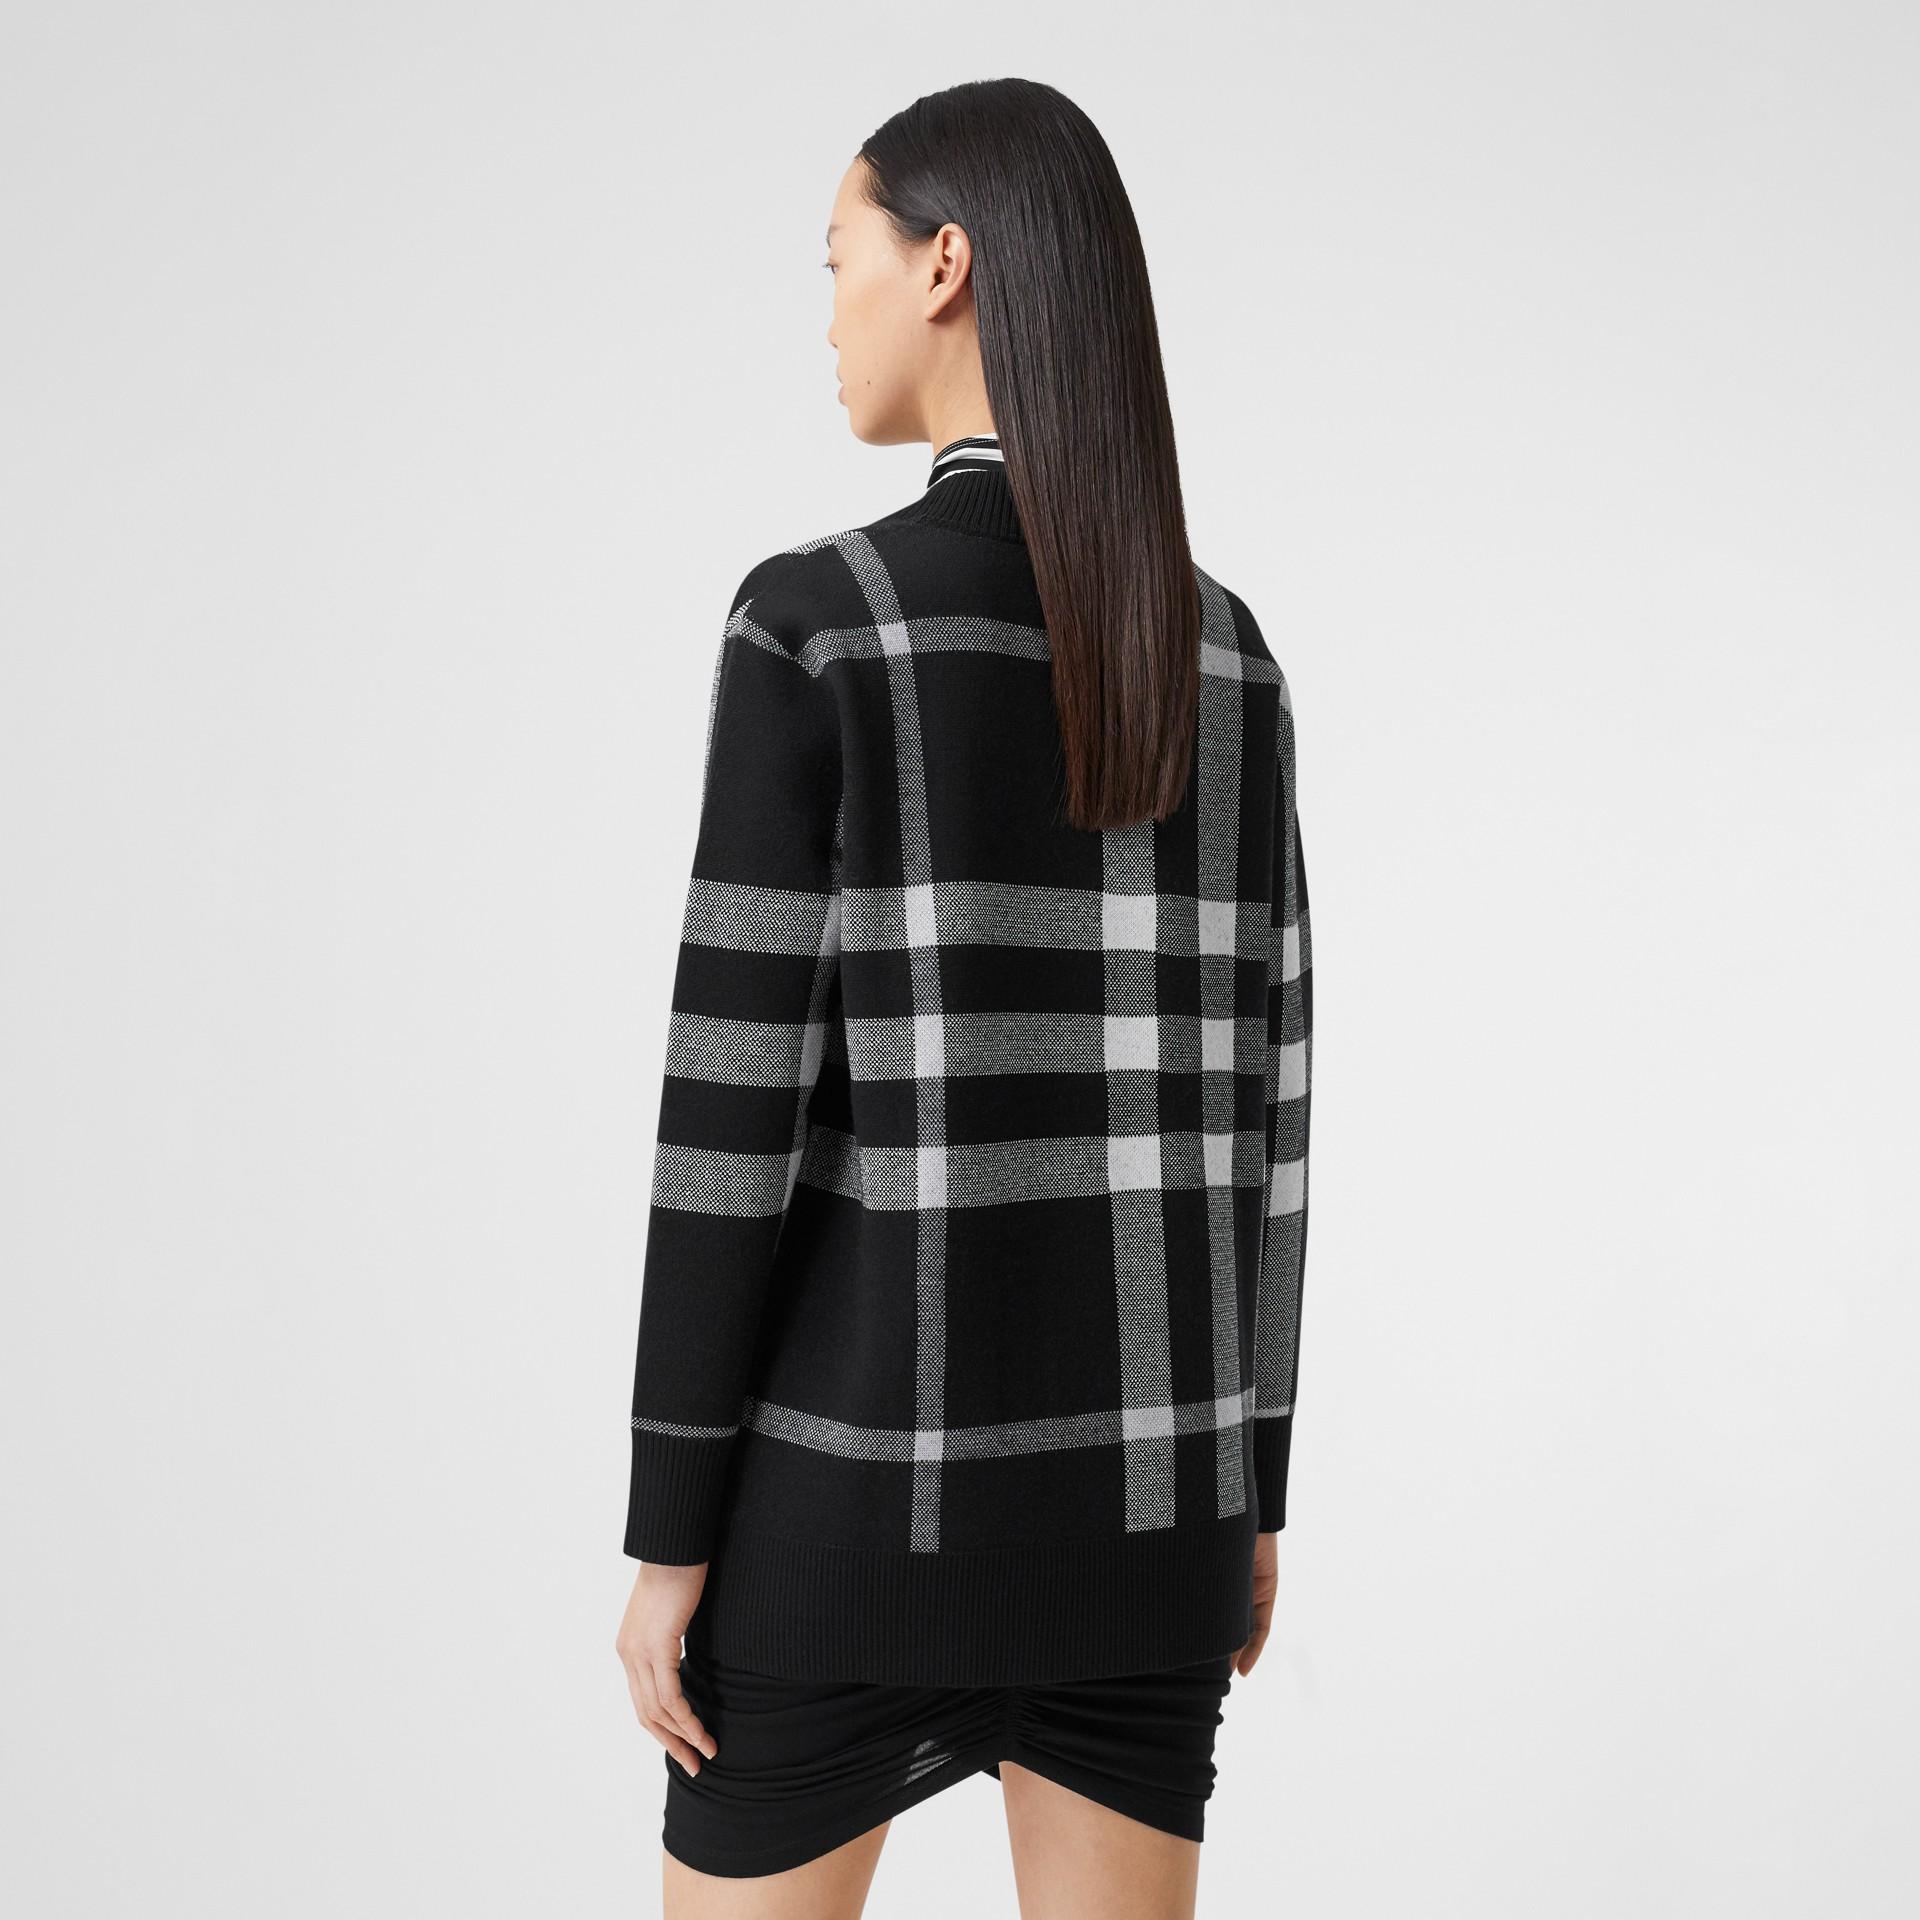 Deer Motif Check Wool Blend Jacquard Cardigan in Black - Women | Burberry - gallery image 3